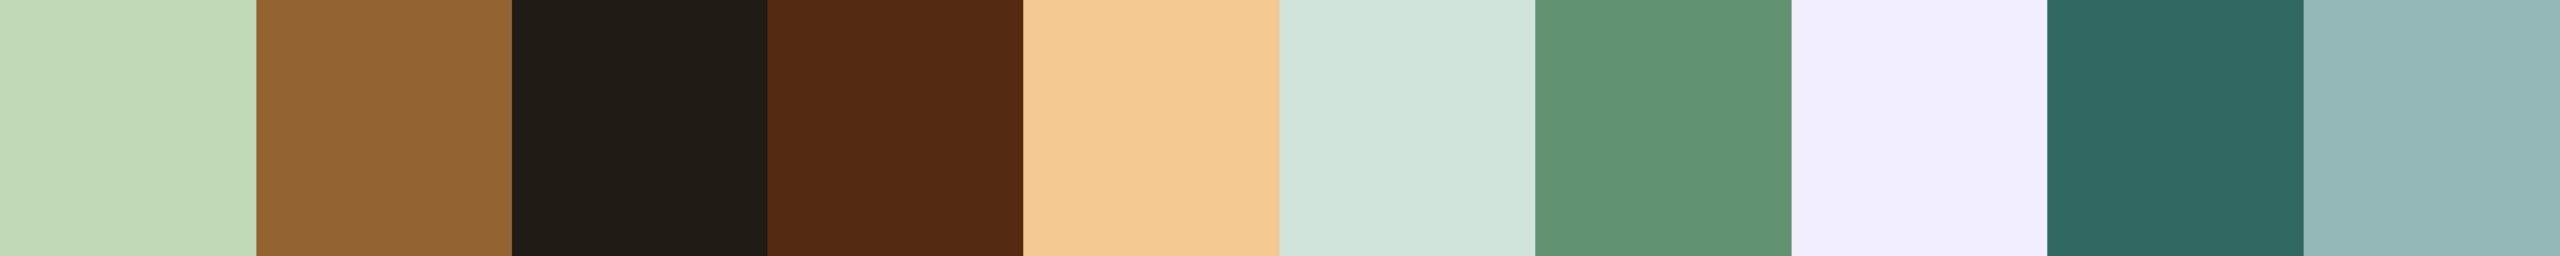 75 Verilia Color Palette